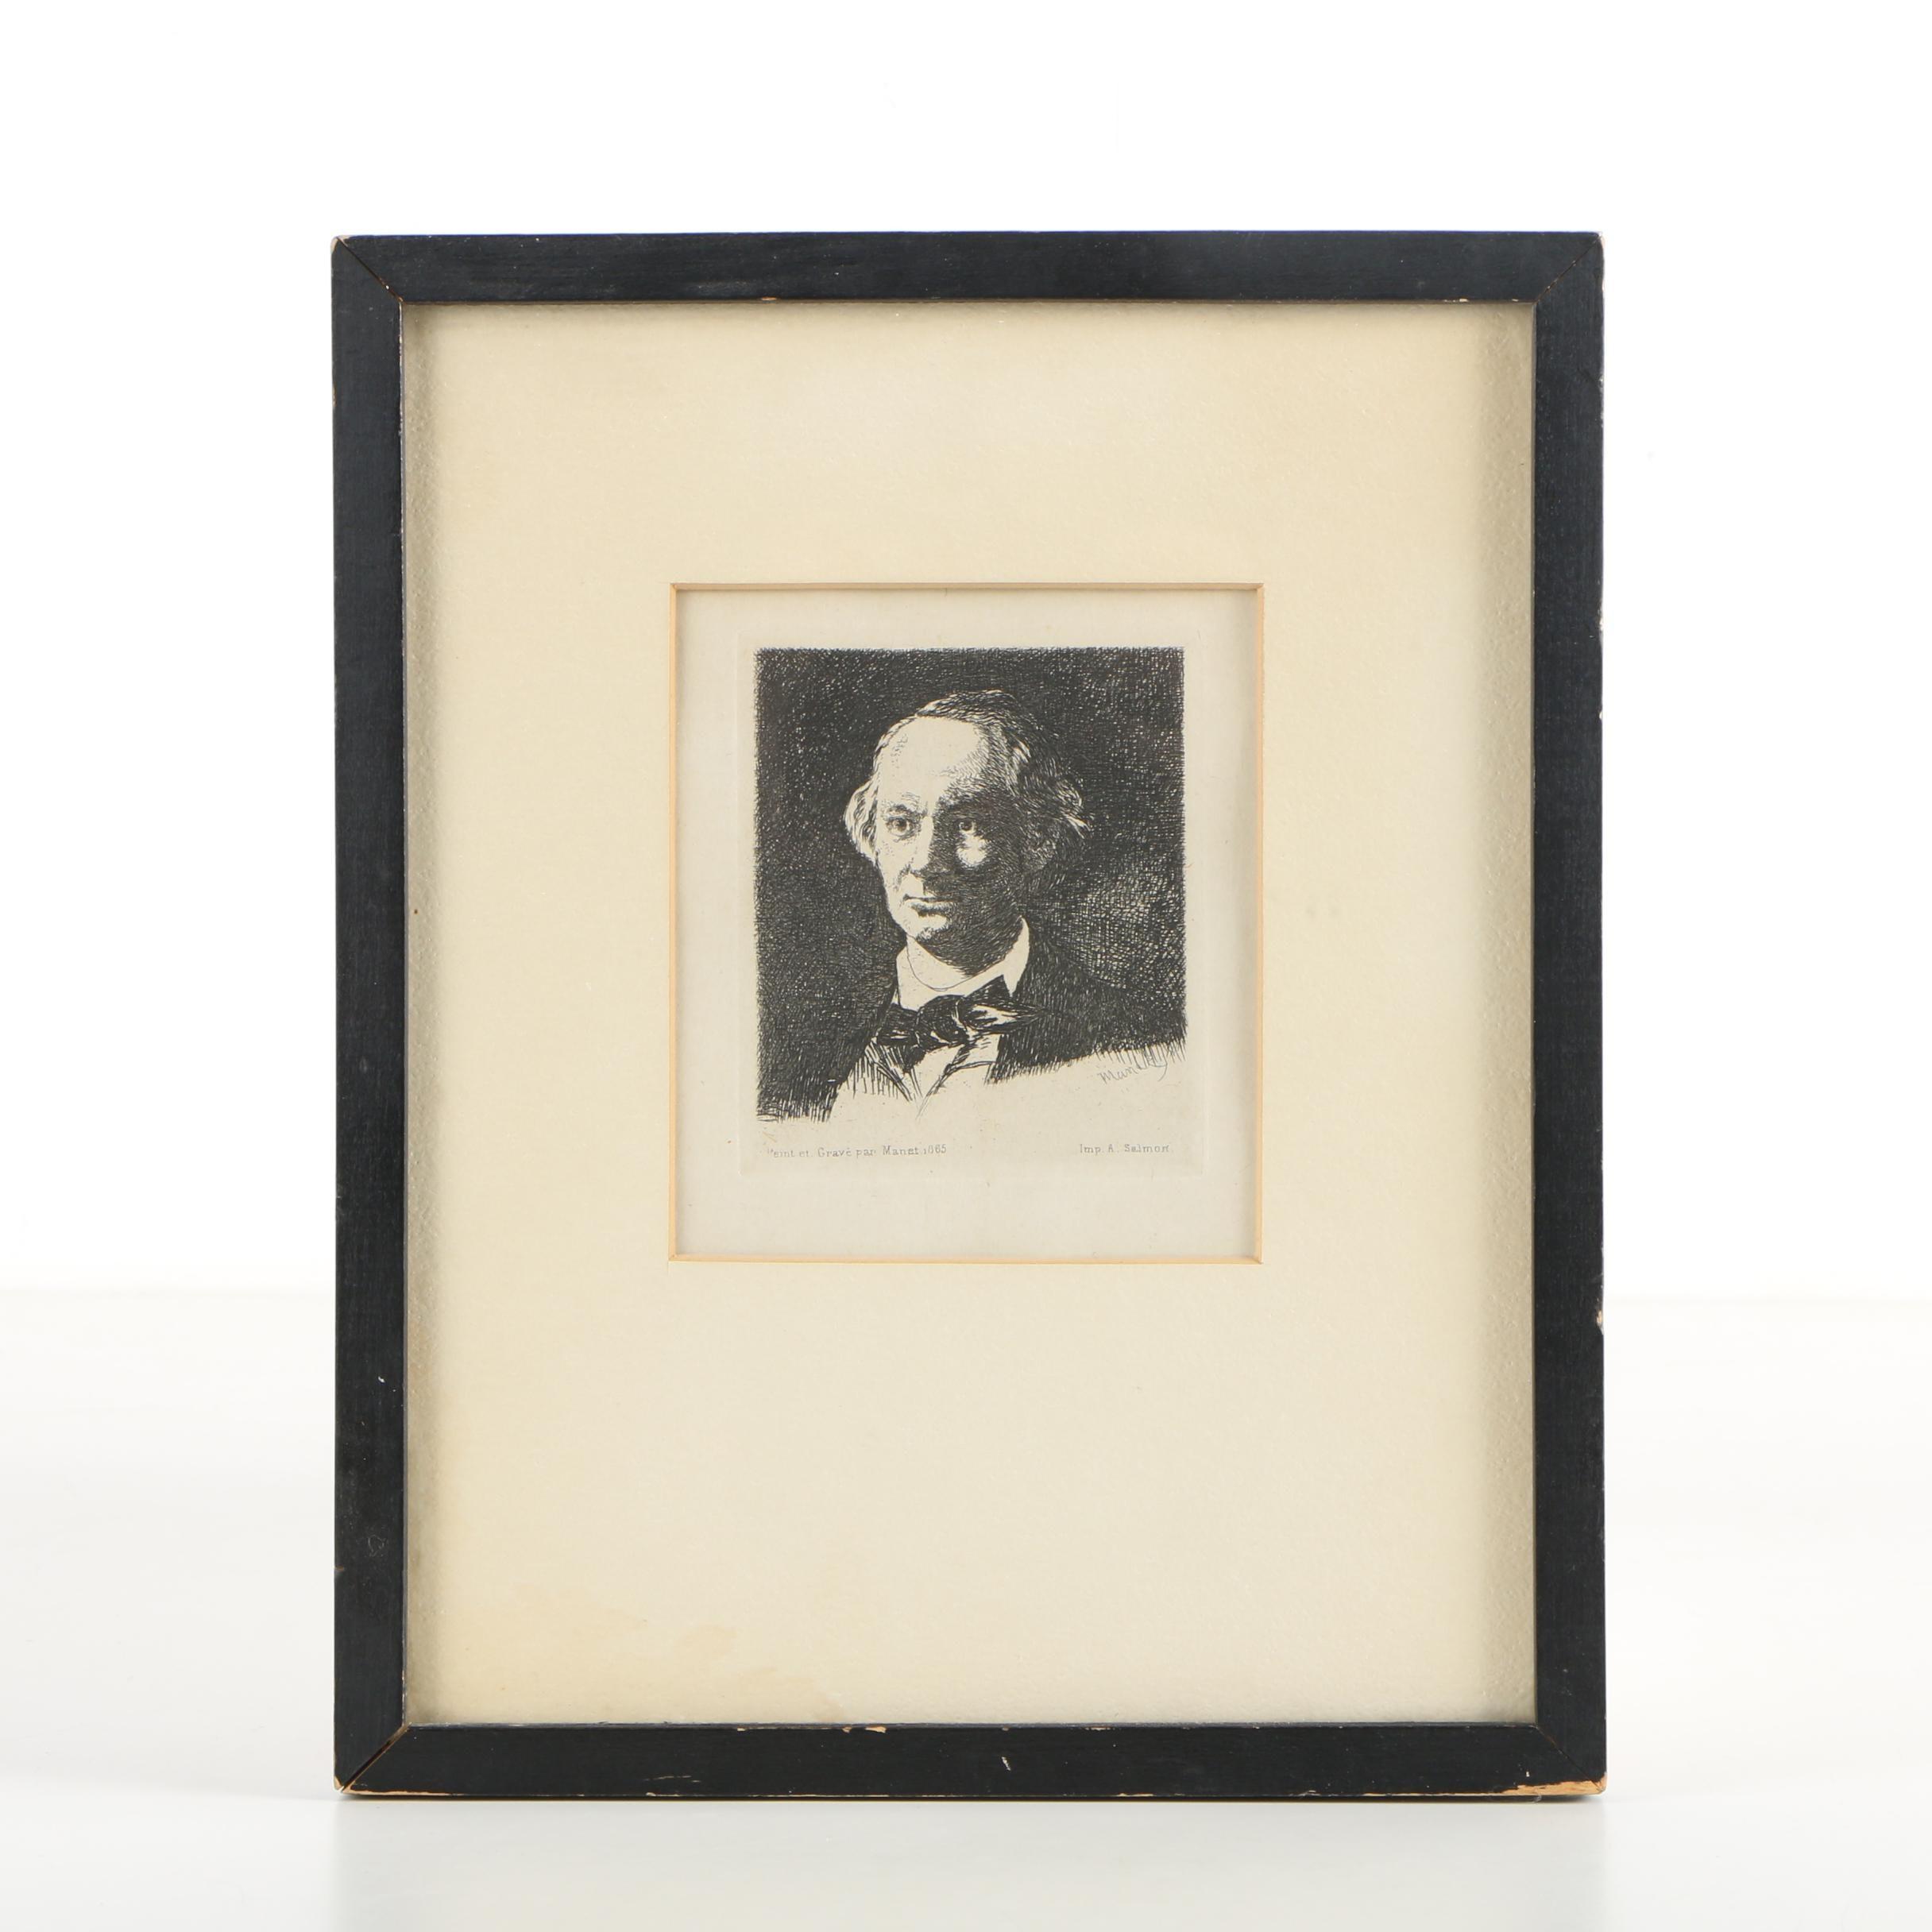 "Restrike Etching After Édouard Manet ""Charles Baudelaire, de Face"""""